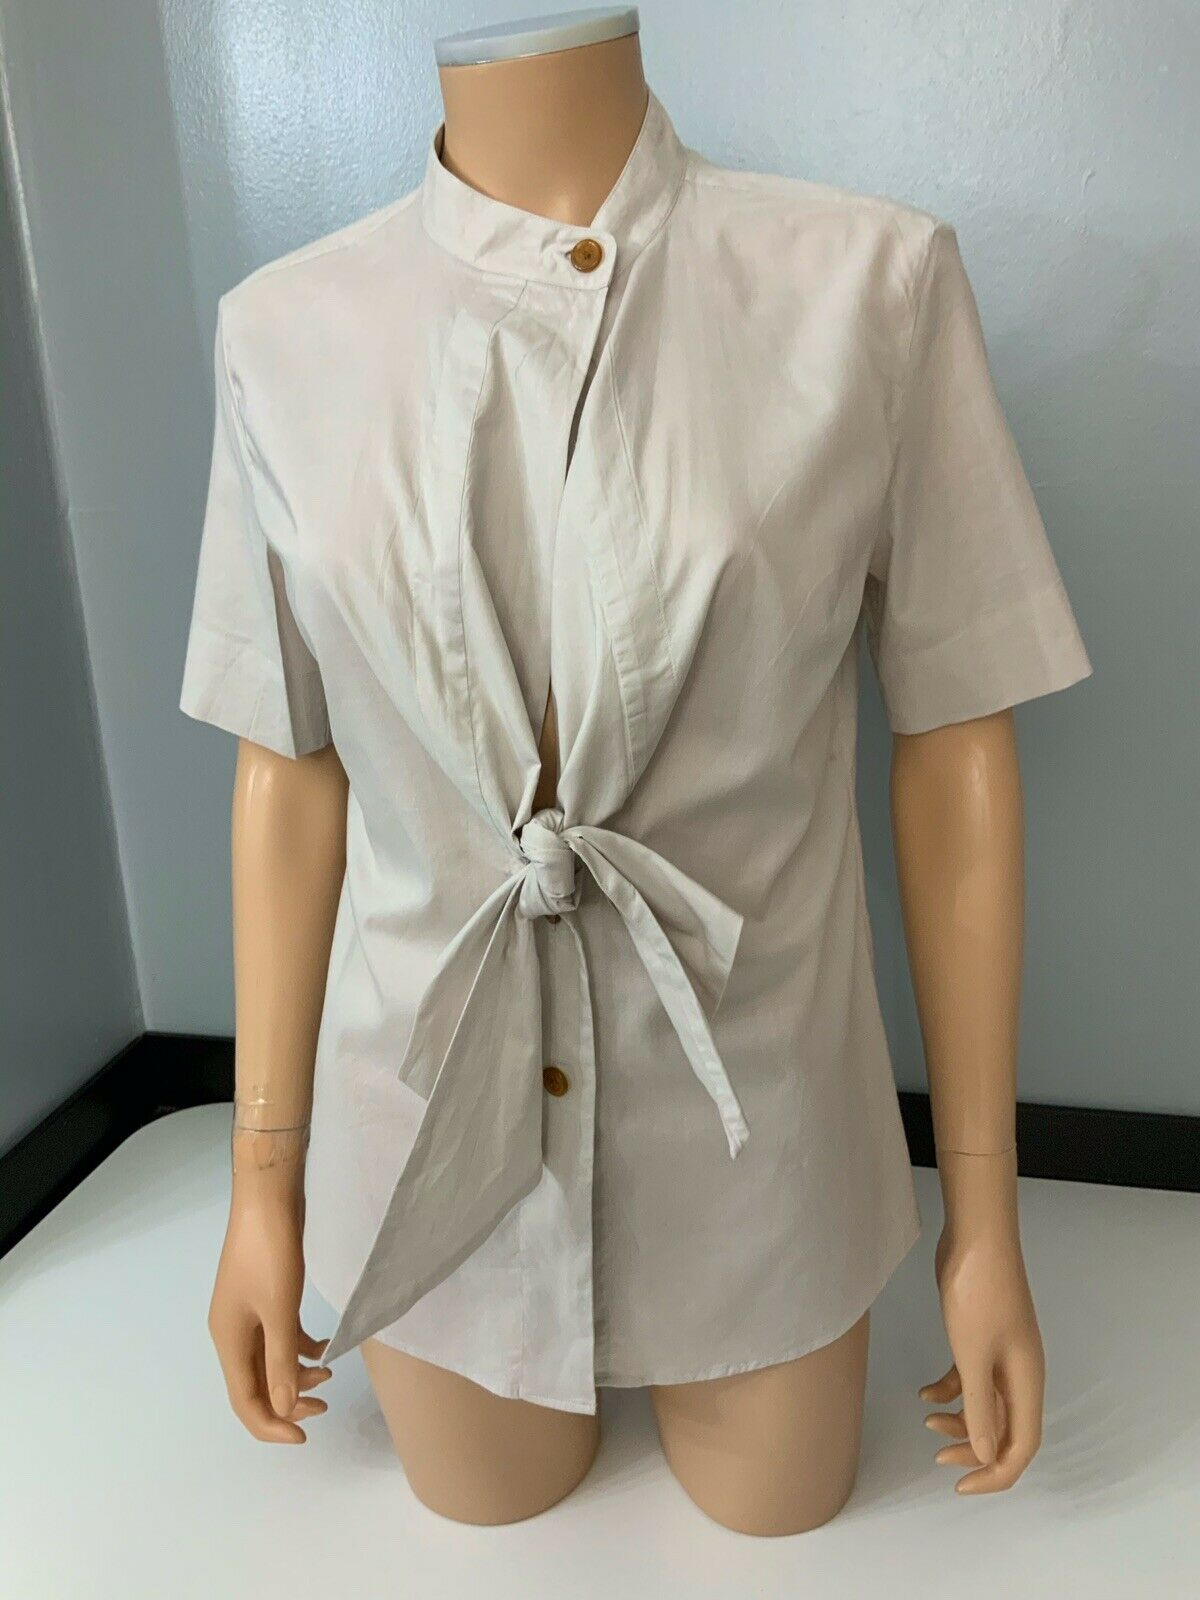 Vivienne Westwood Beige rot Label Hemd Blouse Vgc Größe 3 Uk 10 daMänner's